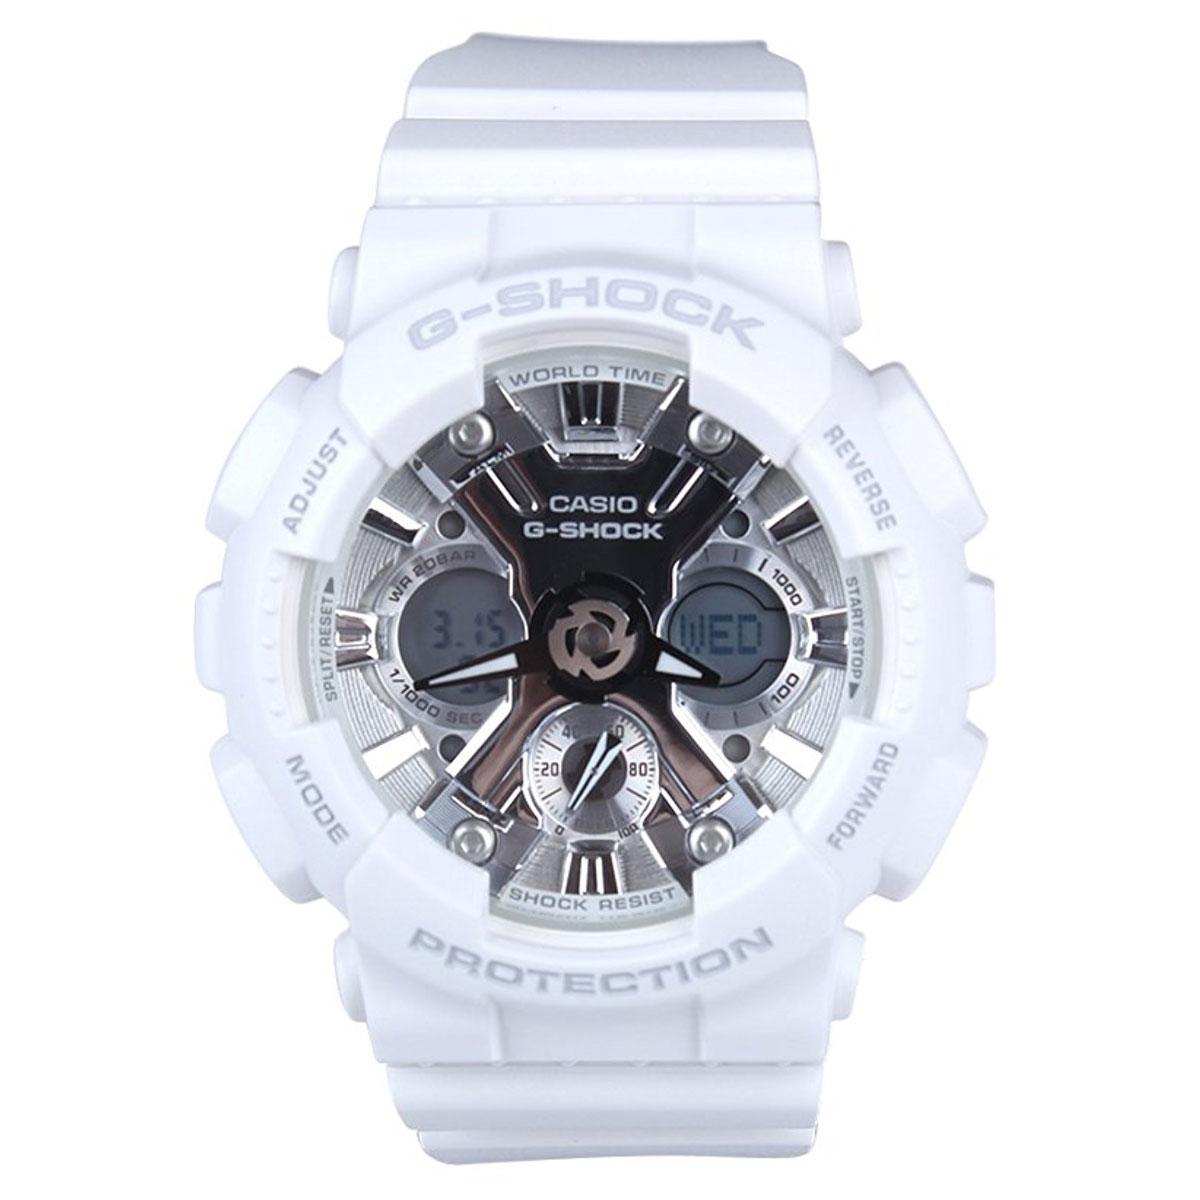 GMAS120MF-7A1 Casio G-Shock S Series Watch  cf65b69d2